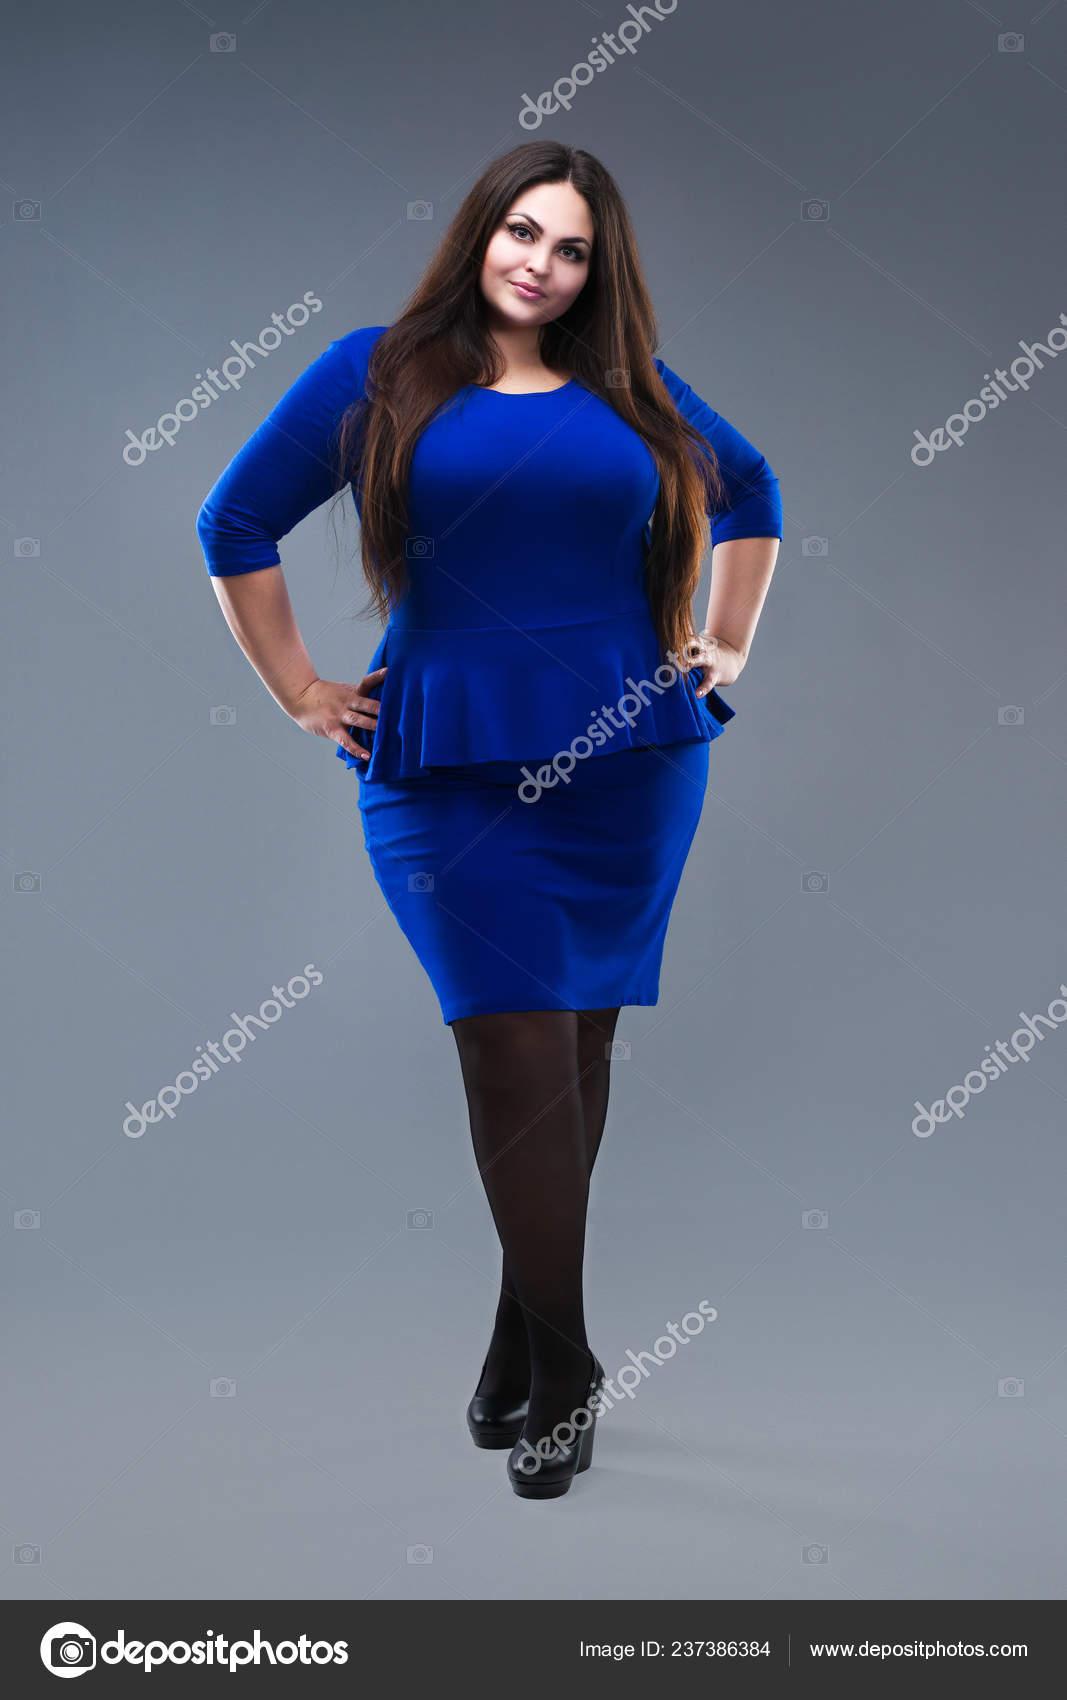 2c4e1fc01c7 Size Fashion Model Blue Dress Fat Woman Gray Studio Background ...